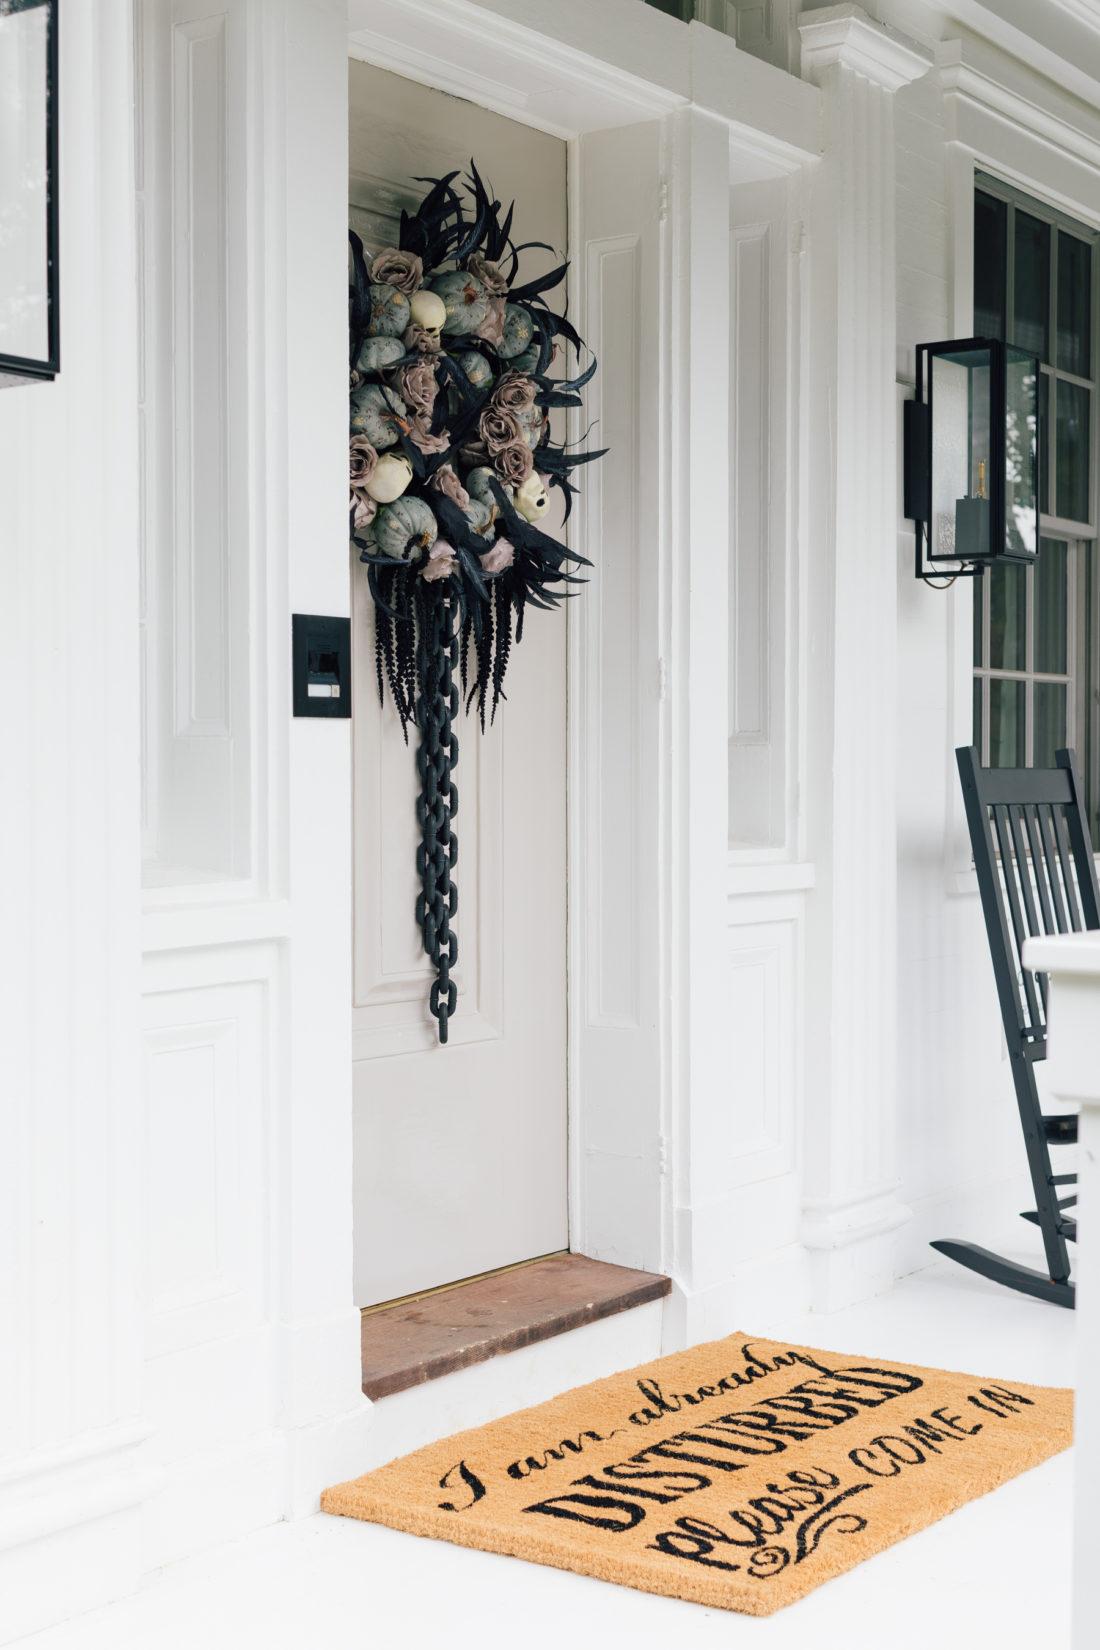 Eva Amurri Martino decorates her house for Halloween